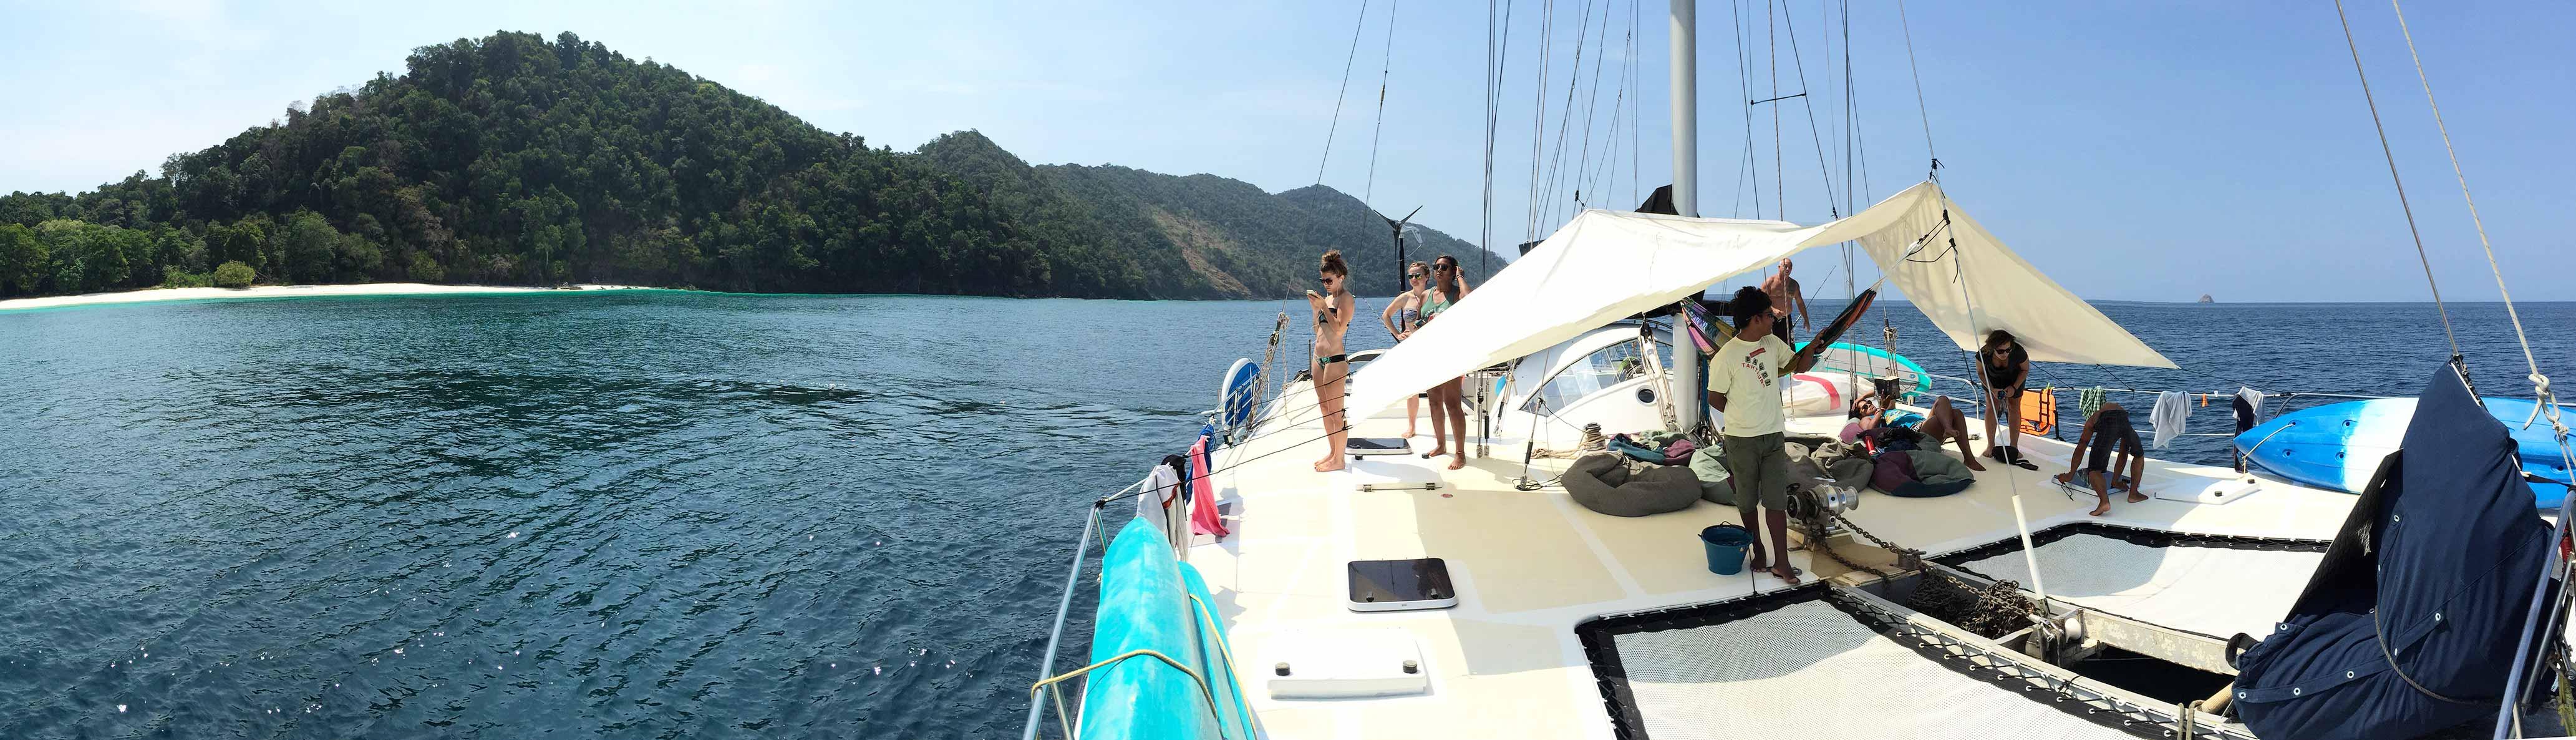 Mergui Archipelago Sailing Experience departing from Khao Lak